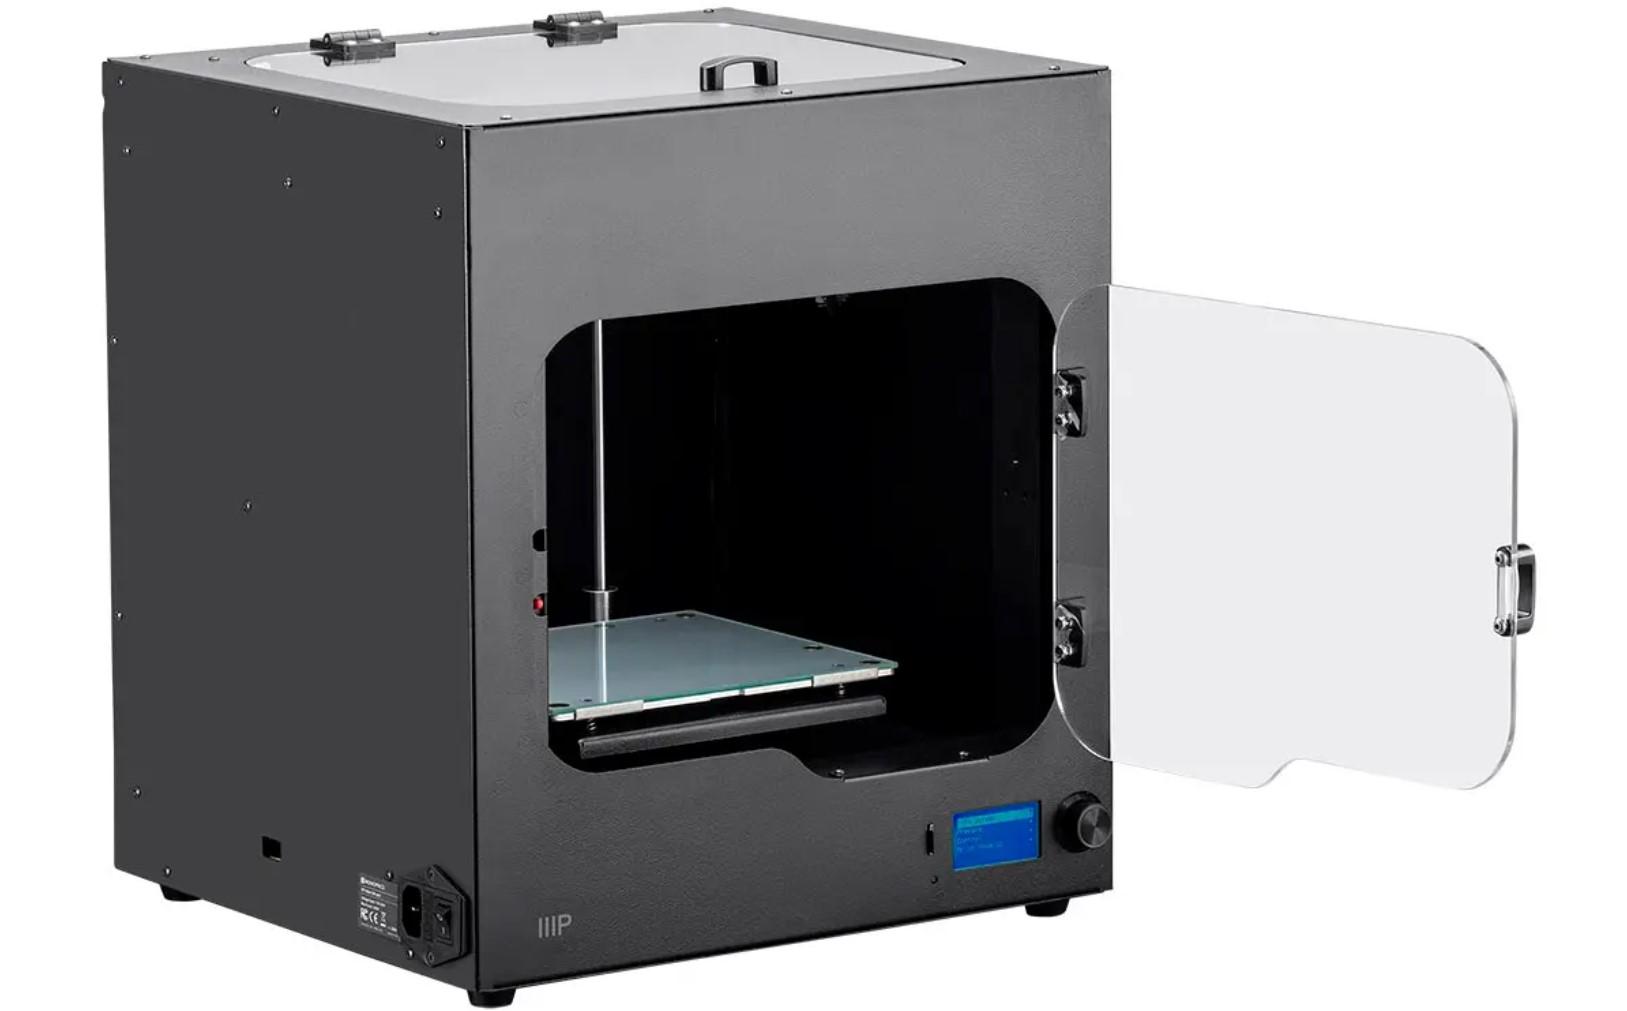 Monoprice Maker Ultimate 2 3D Printer